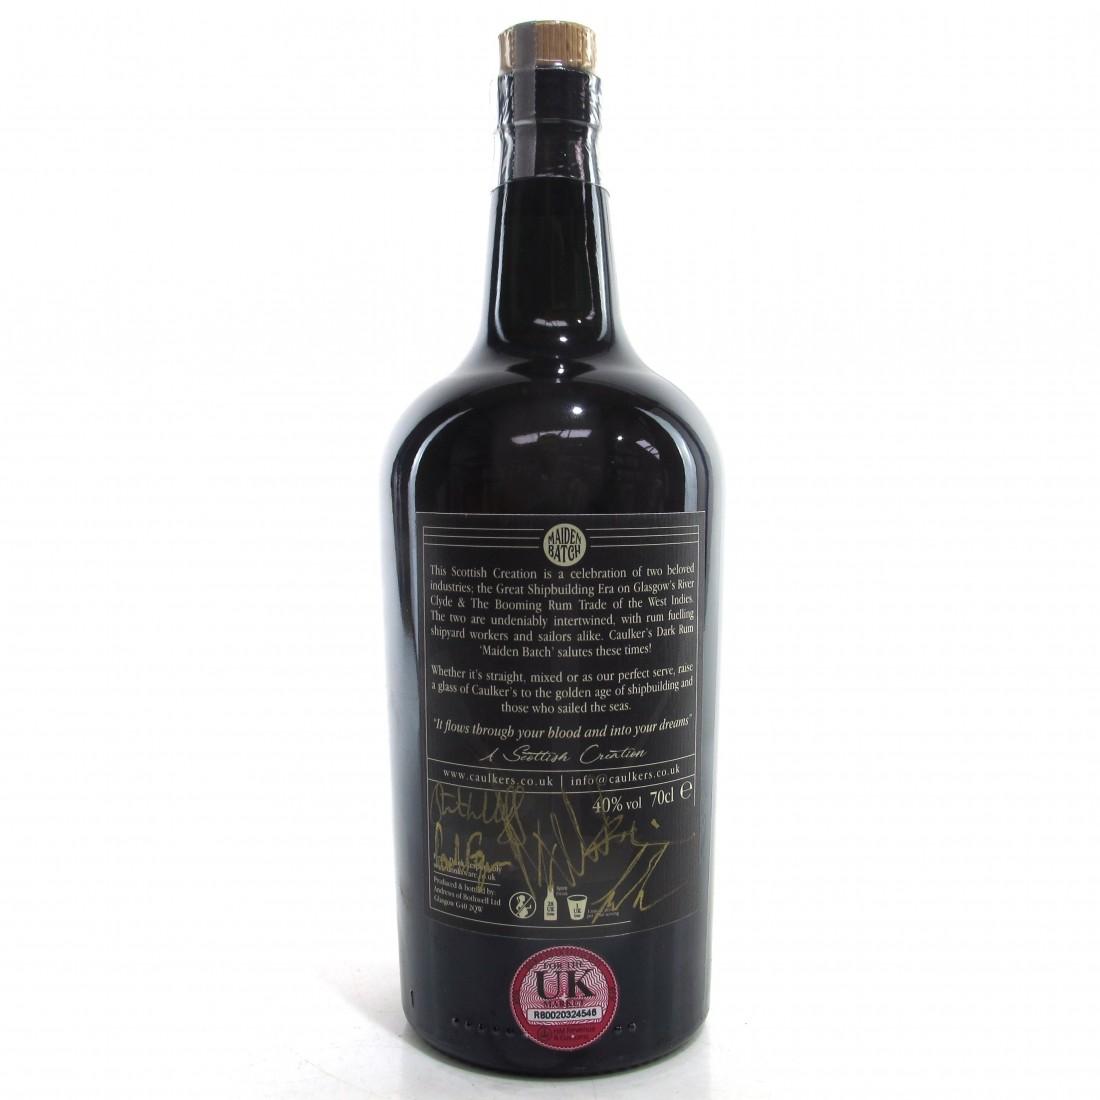 Caulker's Dark Rum Maiden Batch / Signed by Stuart Hogg